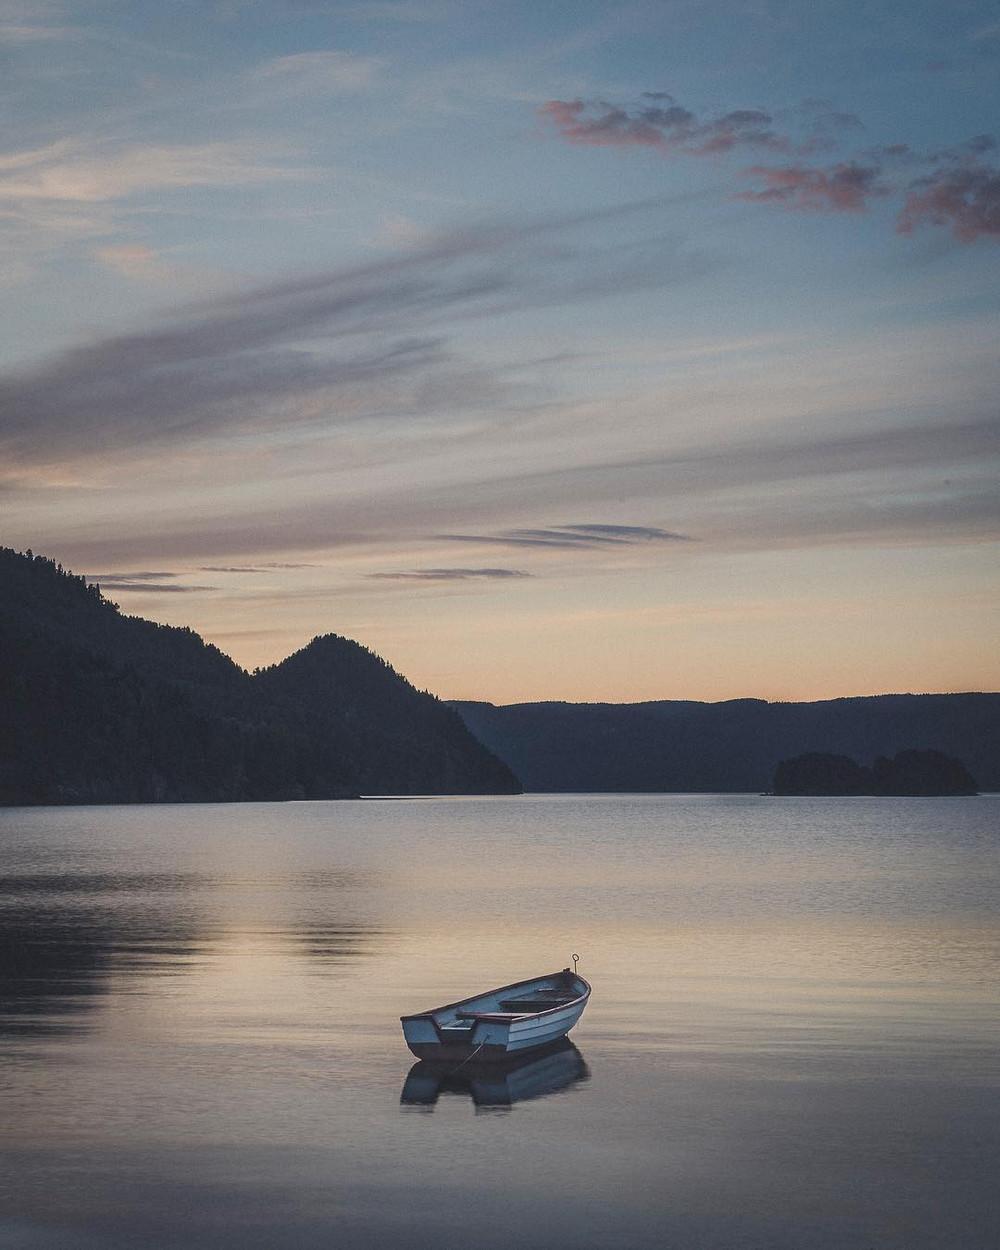 fotografii_norvegiji-13